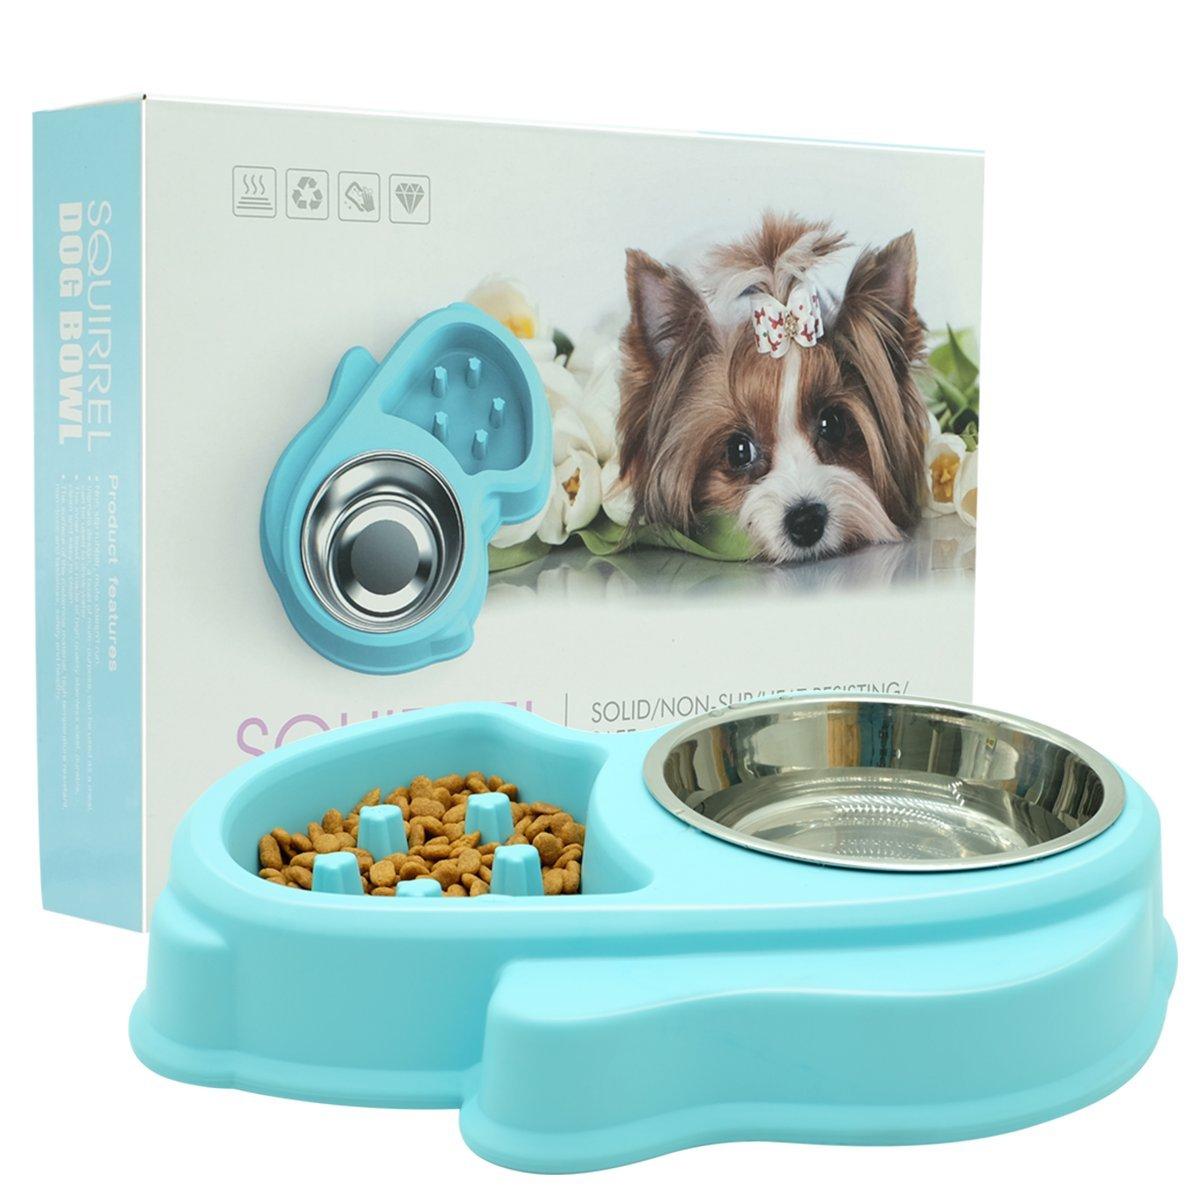 BOOMRO Slow Feeder Dog Bowl - Interactive Fun Slow Eating Bowl for Pets Health Bloat Stop Anti-Choking, Non-Toxic. Eco-Friendly Material (Small Dog Bowl Set)